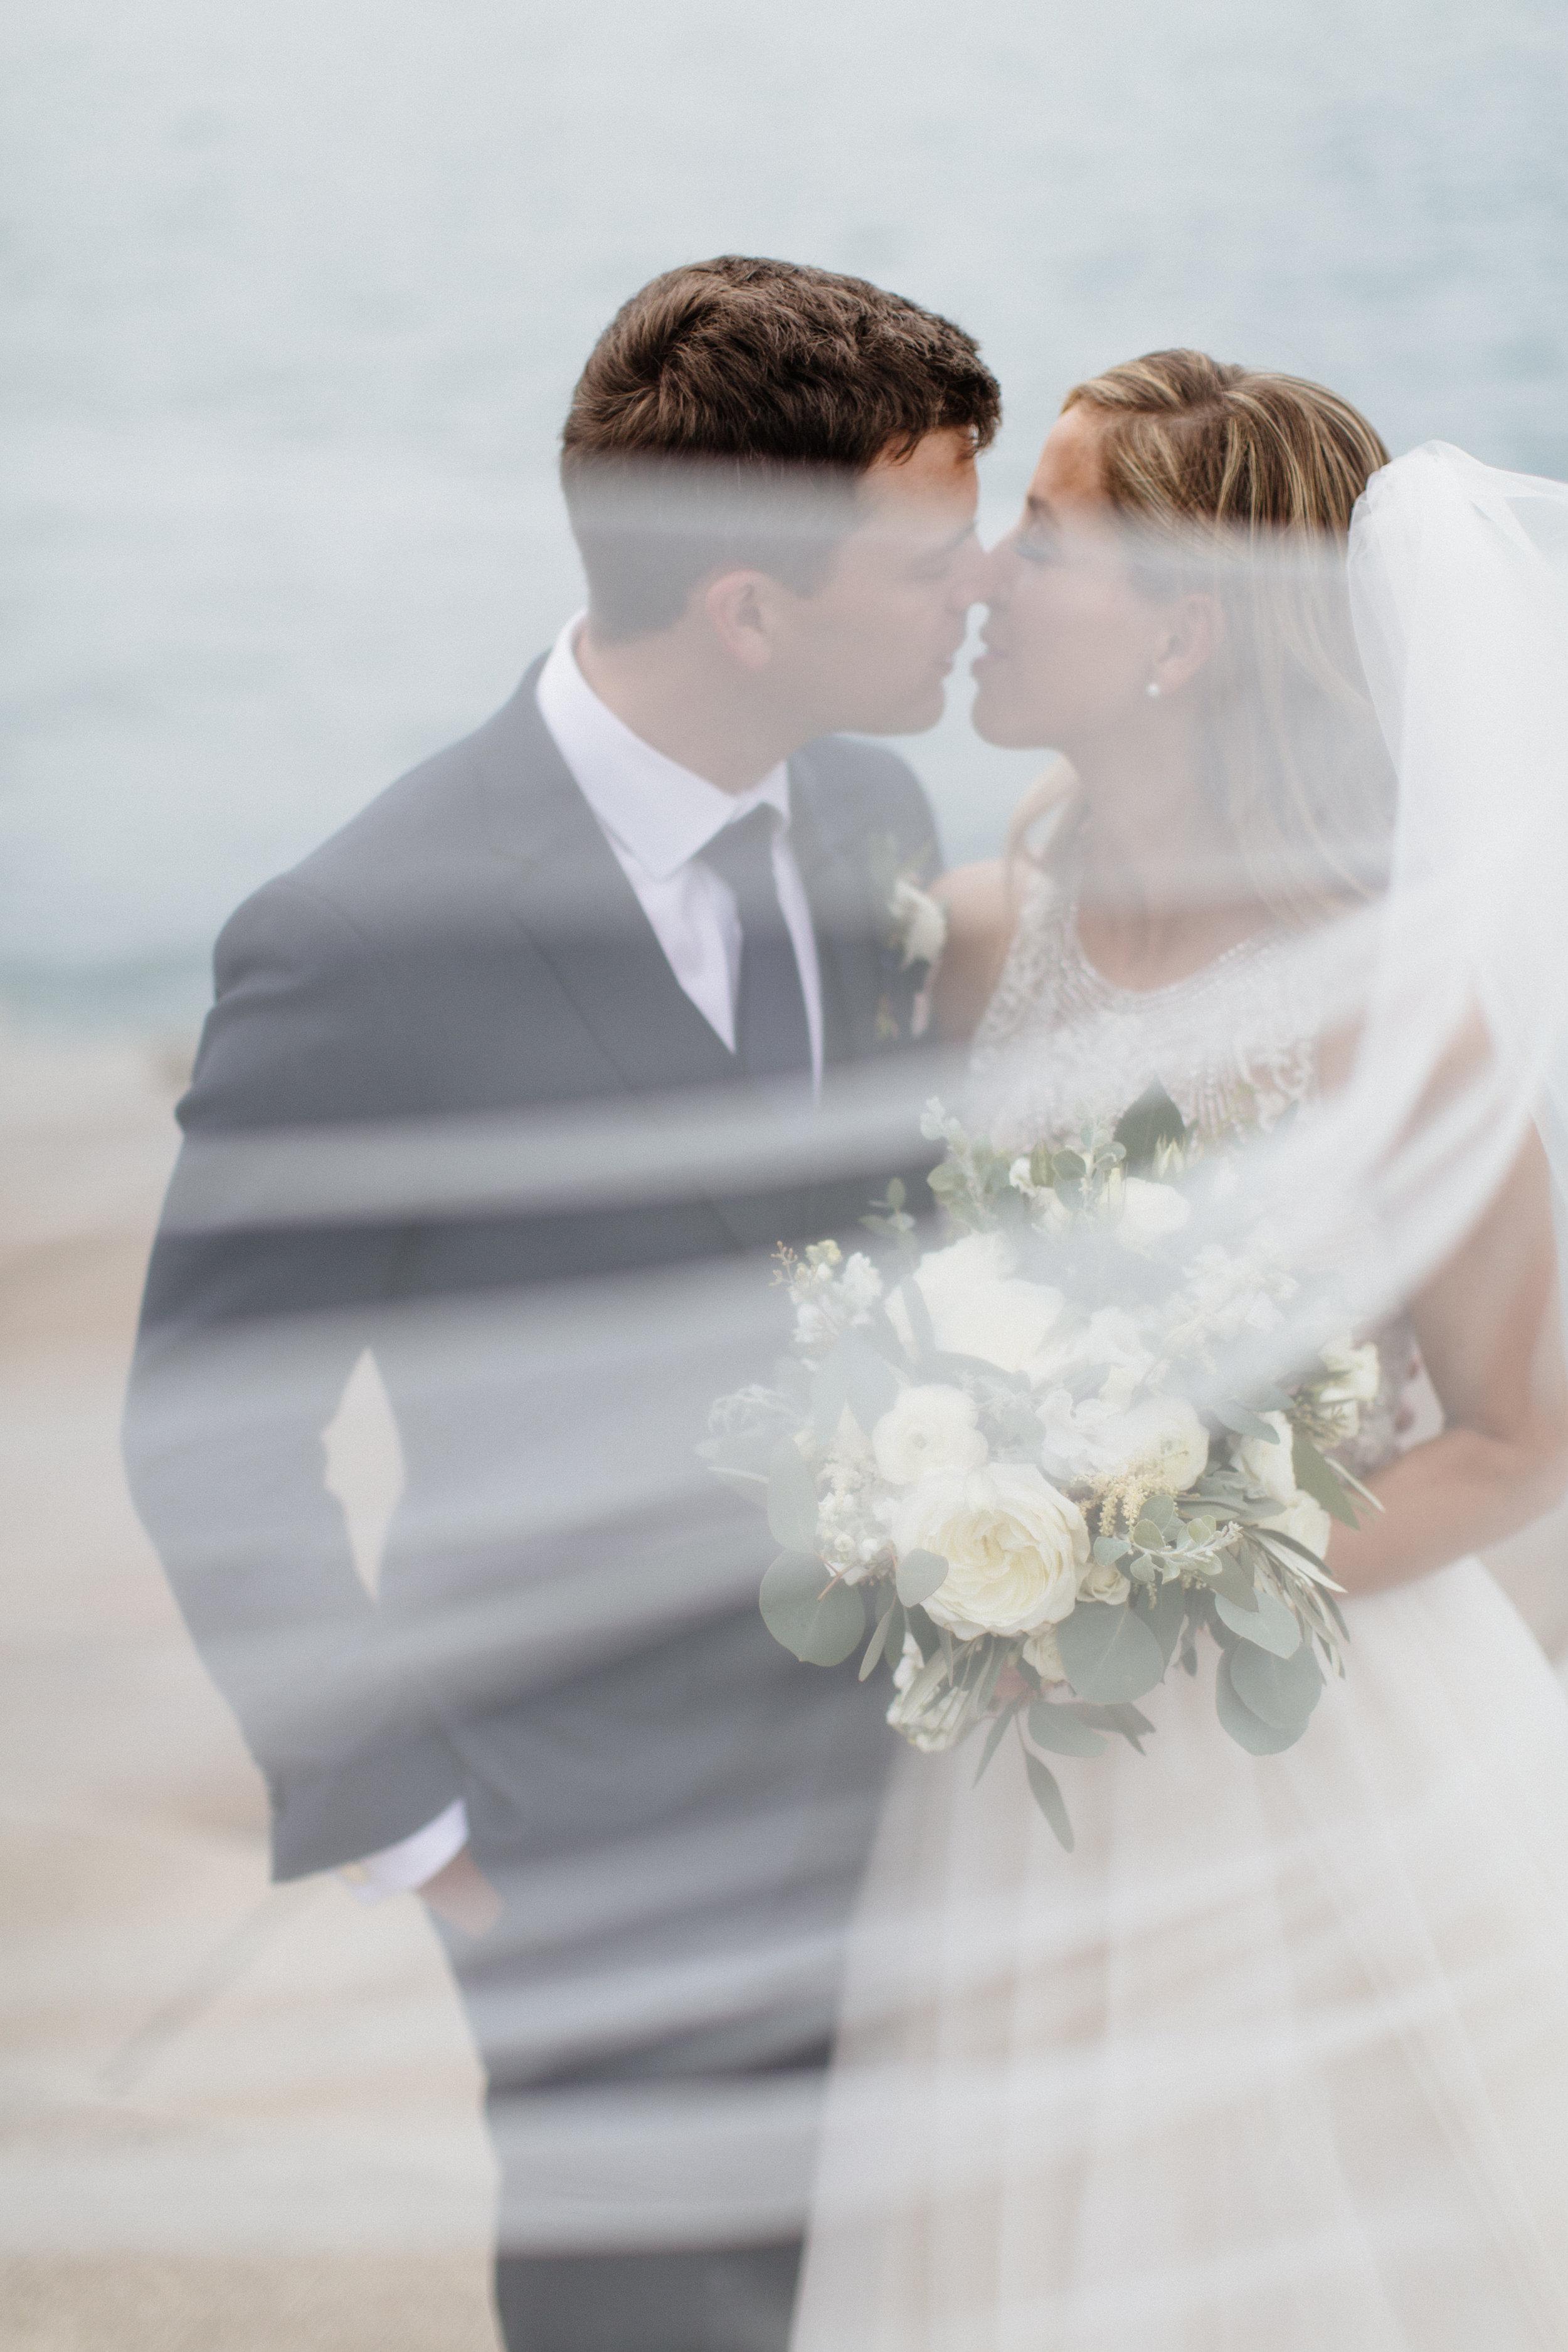 02_jukes_wedding-248.JPG